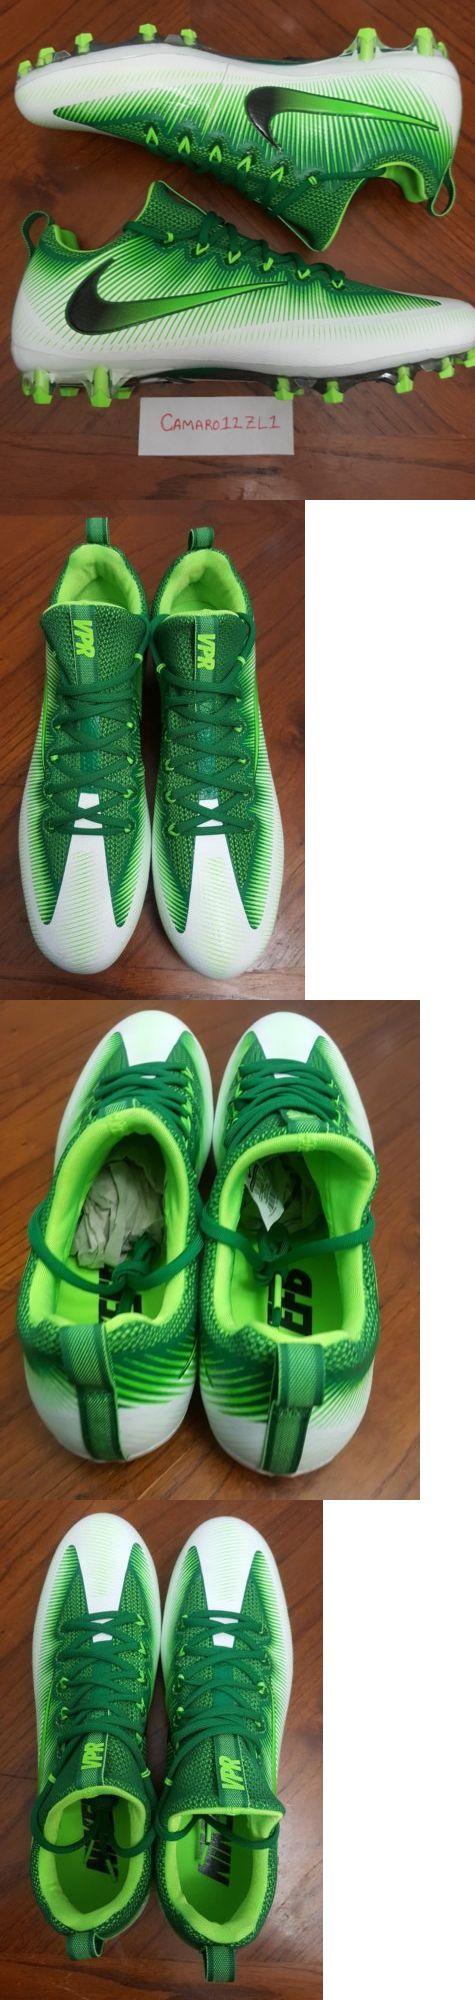 Men 159116: Nike Vapor Untouchable Pro Football Cleats Mens Sz 13 Green White 833385-301 -> BUY IT NOW ONLY: $40 on eBay!